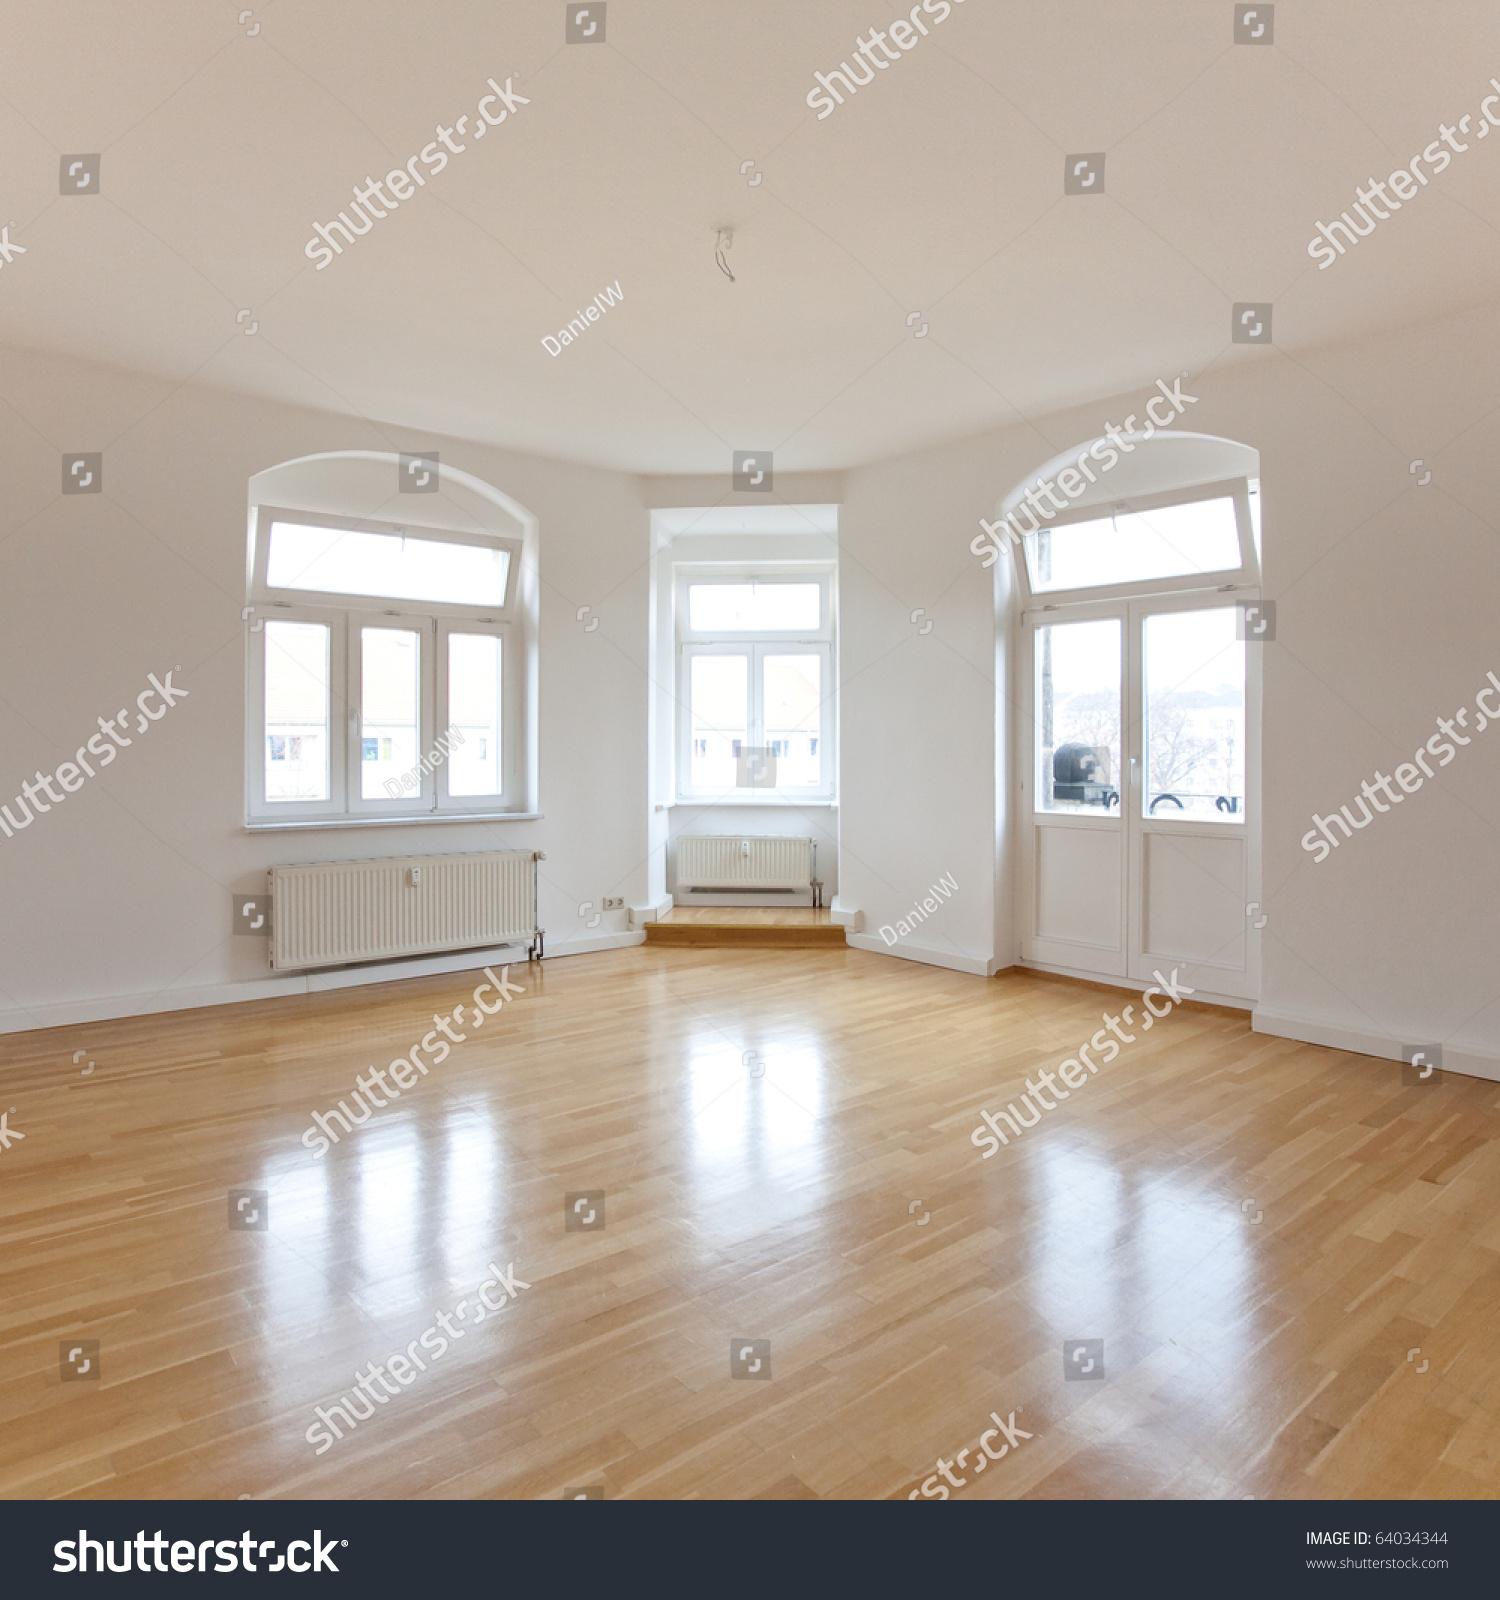 Empty Living Room: Empty Loft Like Living Room Stock Photo 64034344